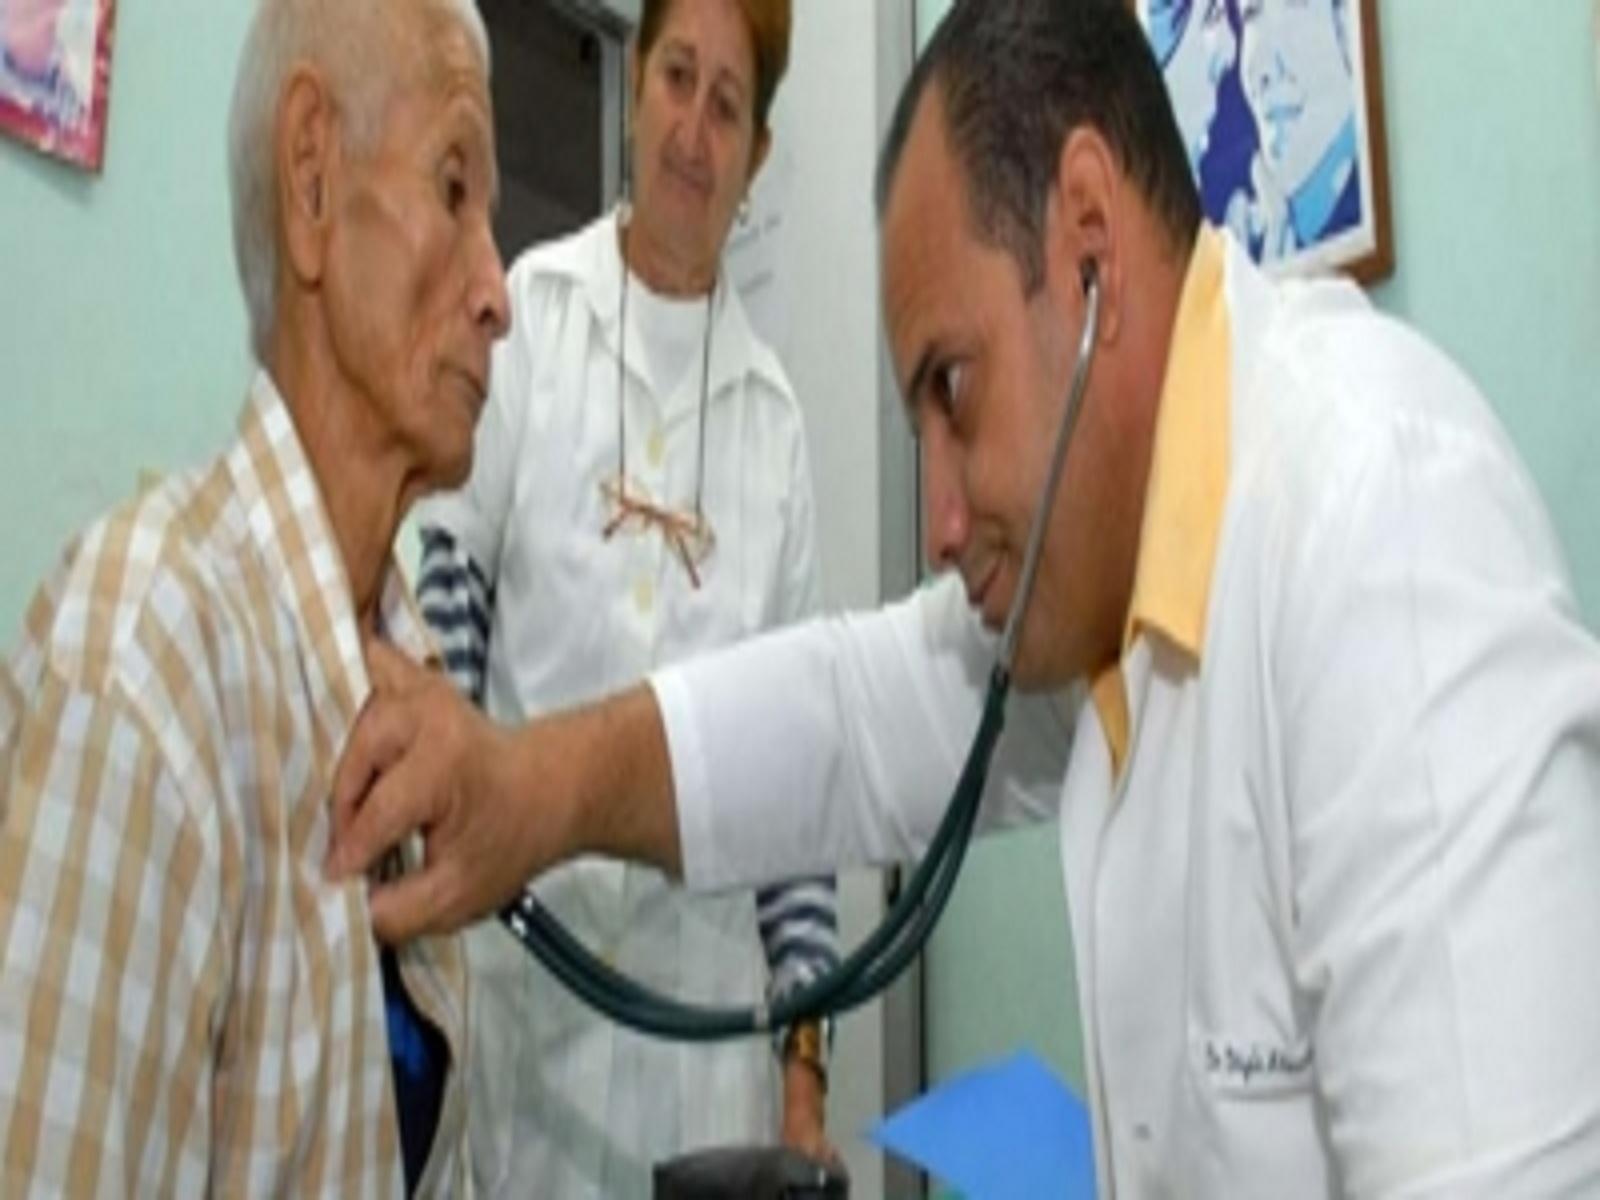 Salud pública en Cuba